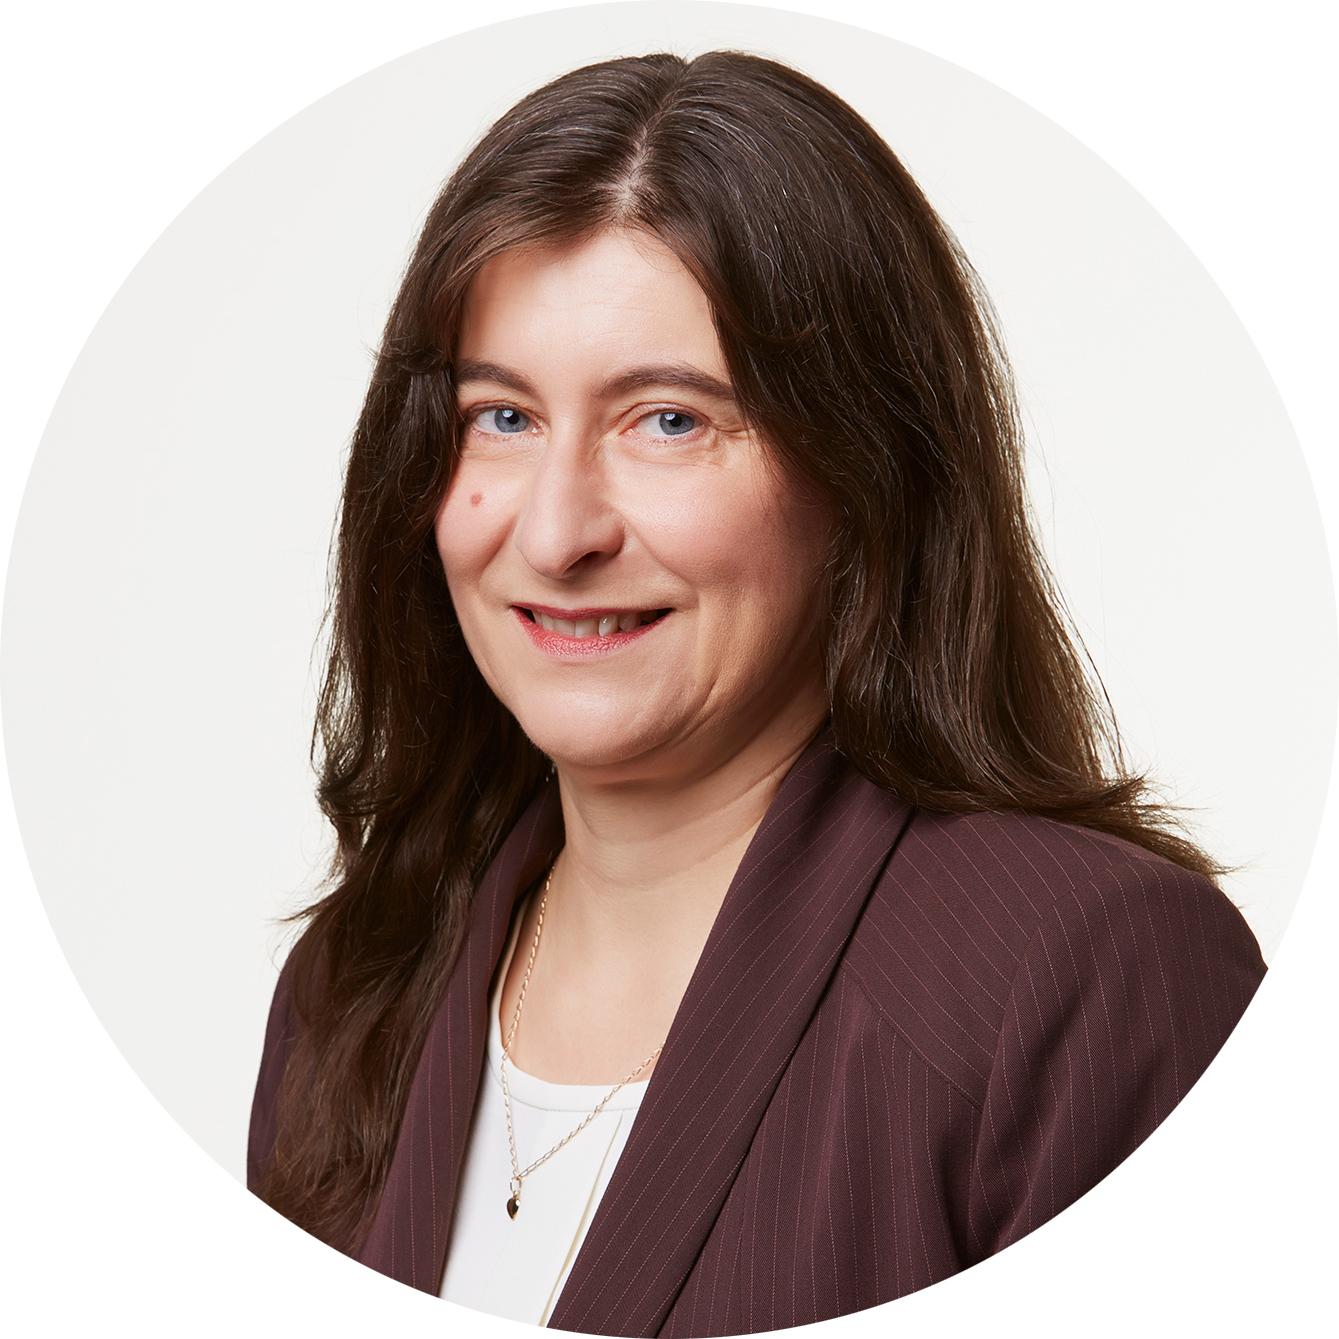 Kathy Harrison, CEO